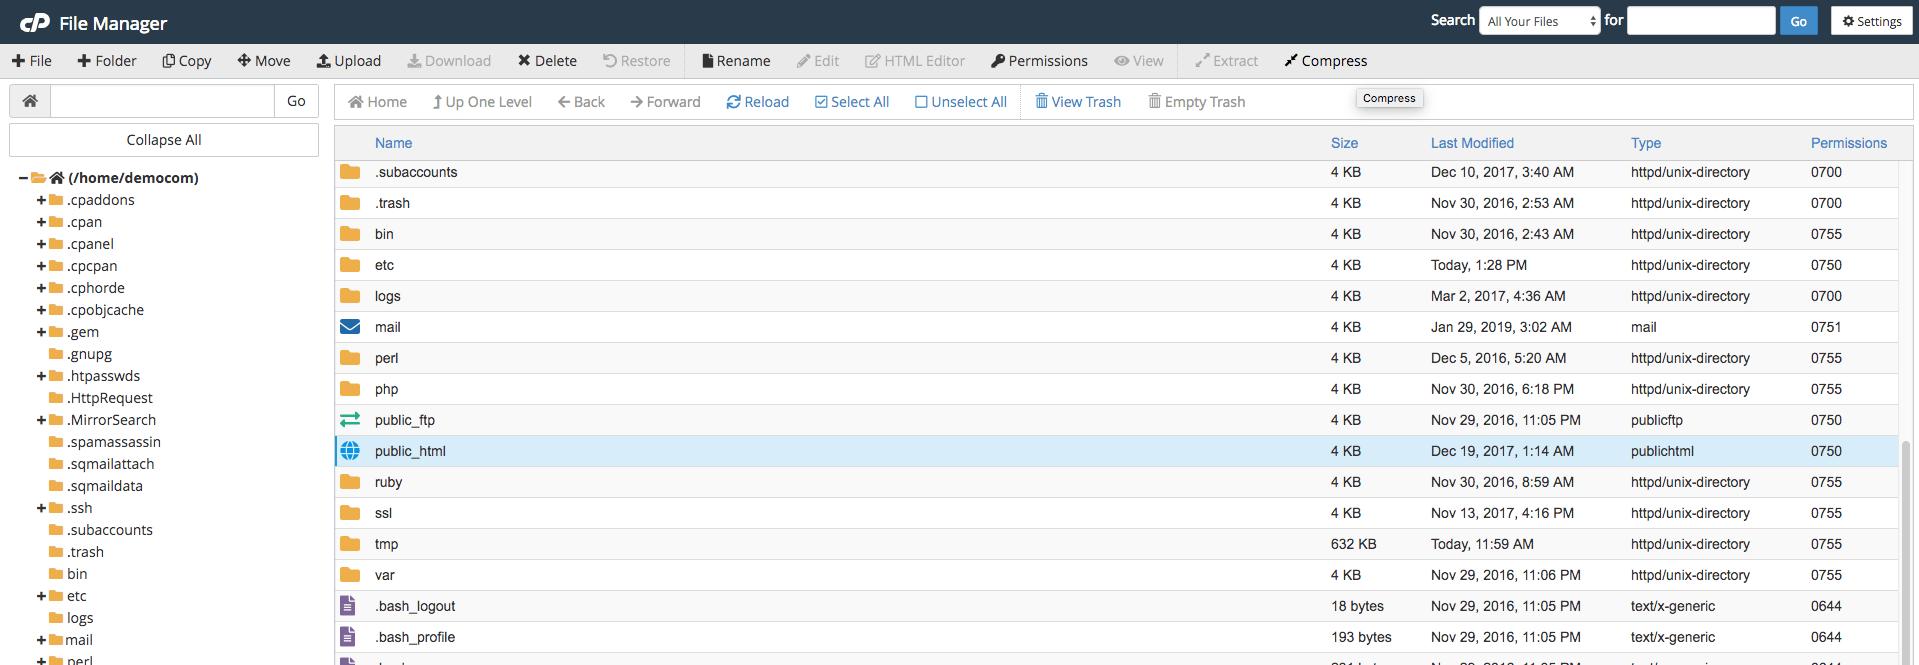 Select public_html and click compress